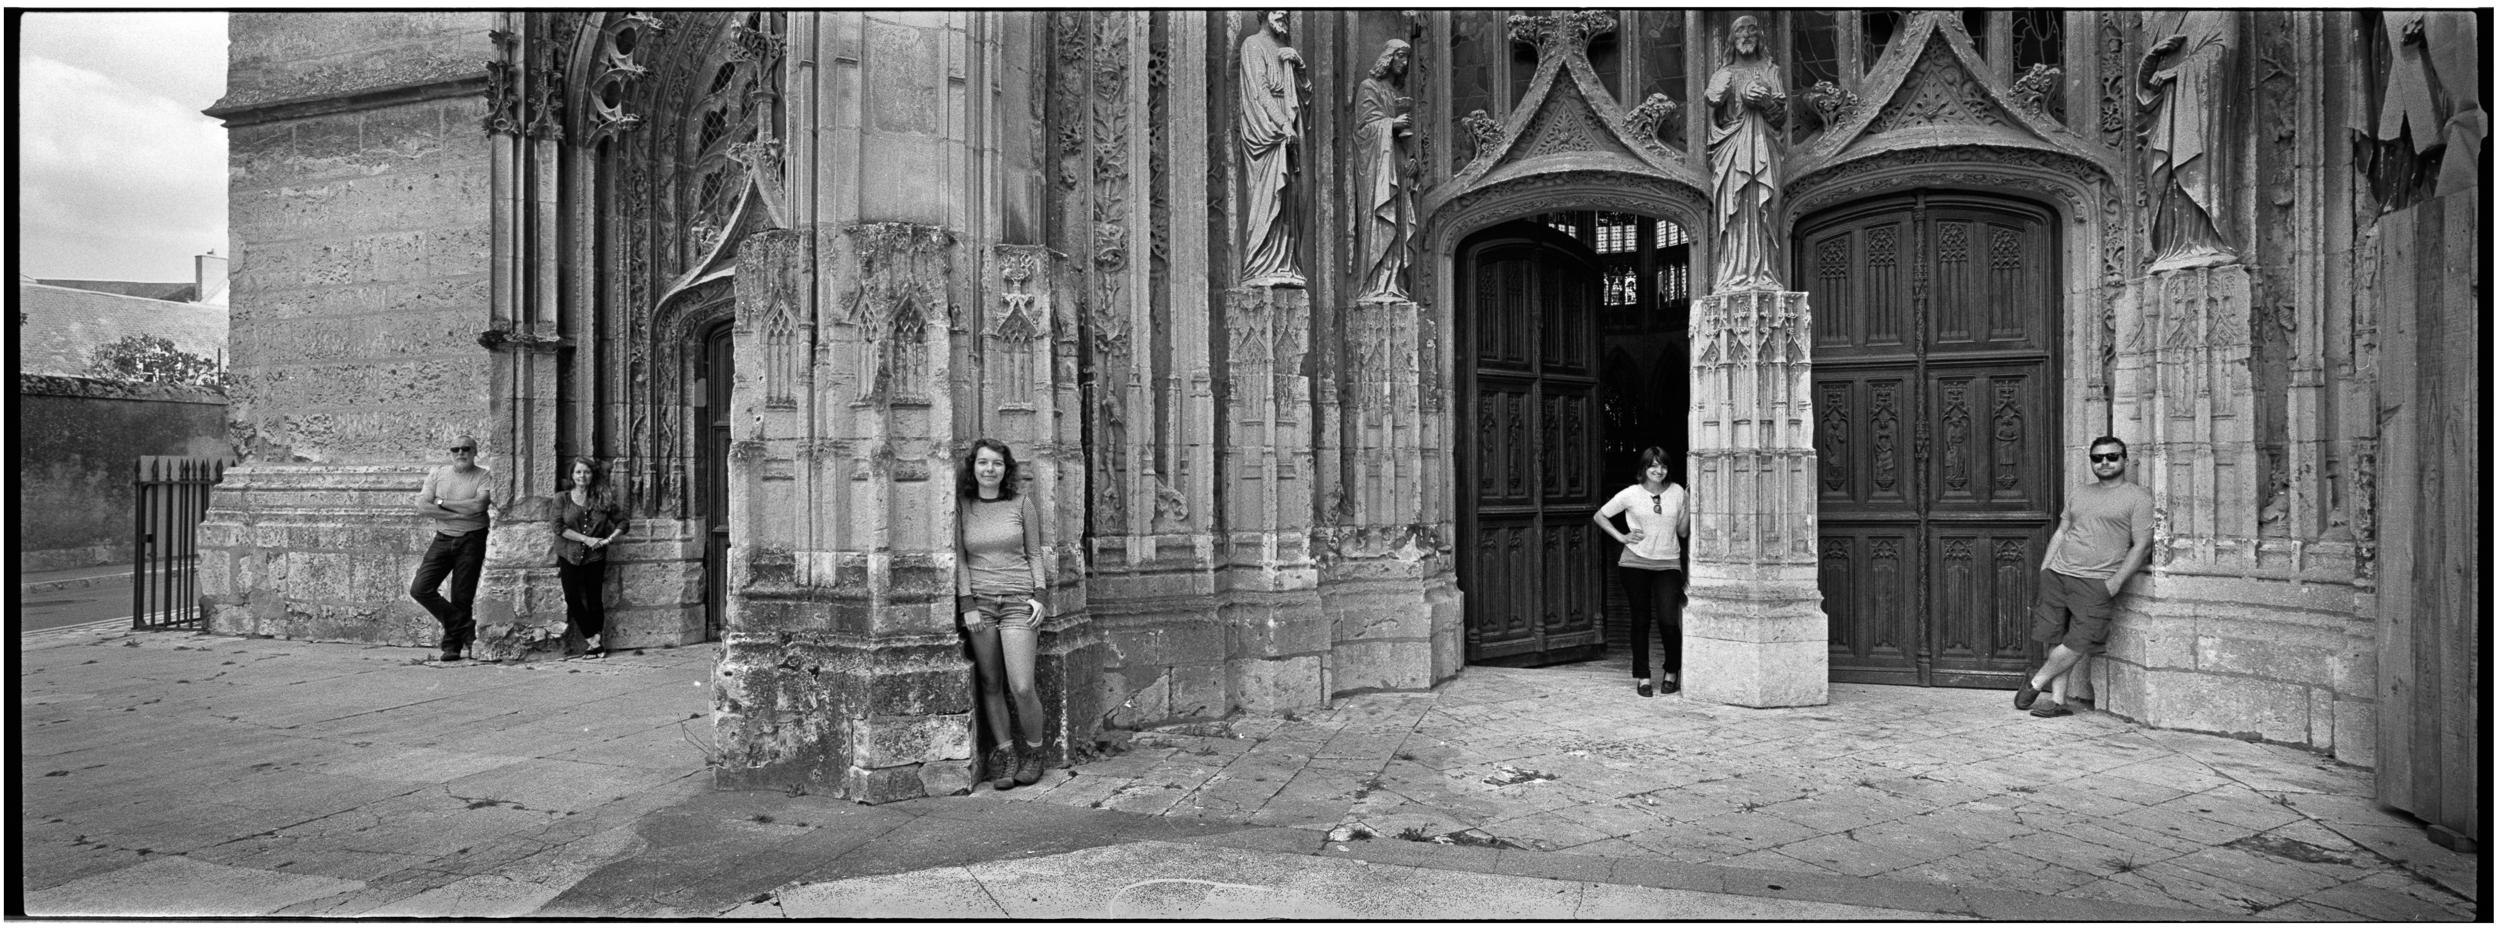 03-France-ChurchFacade5ofUs-print-12.31cropped.jpg